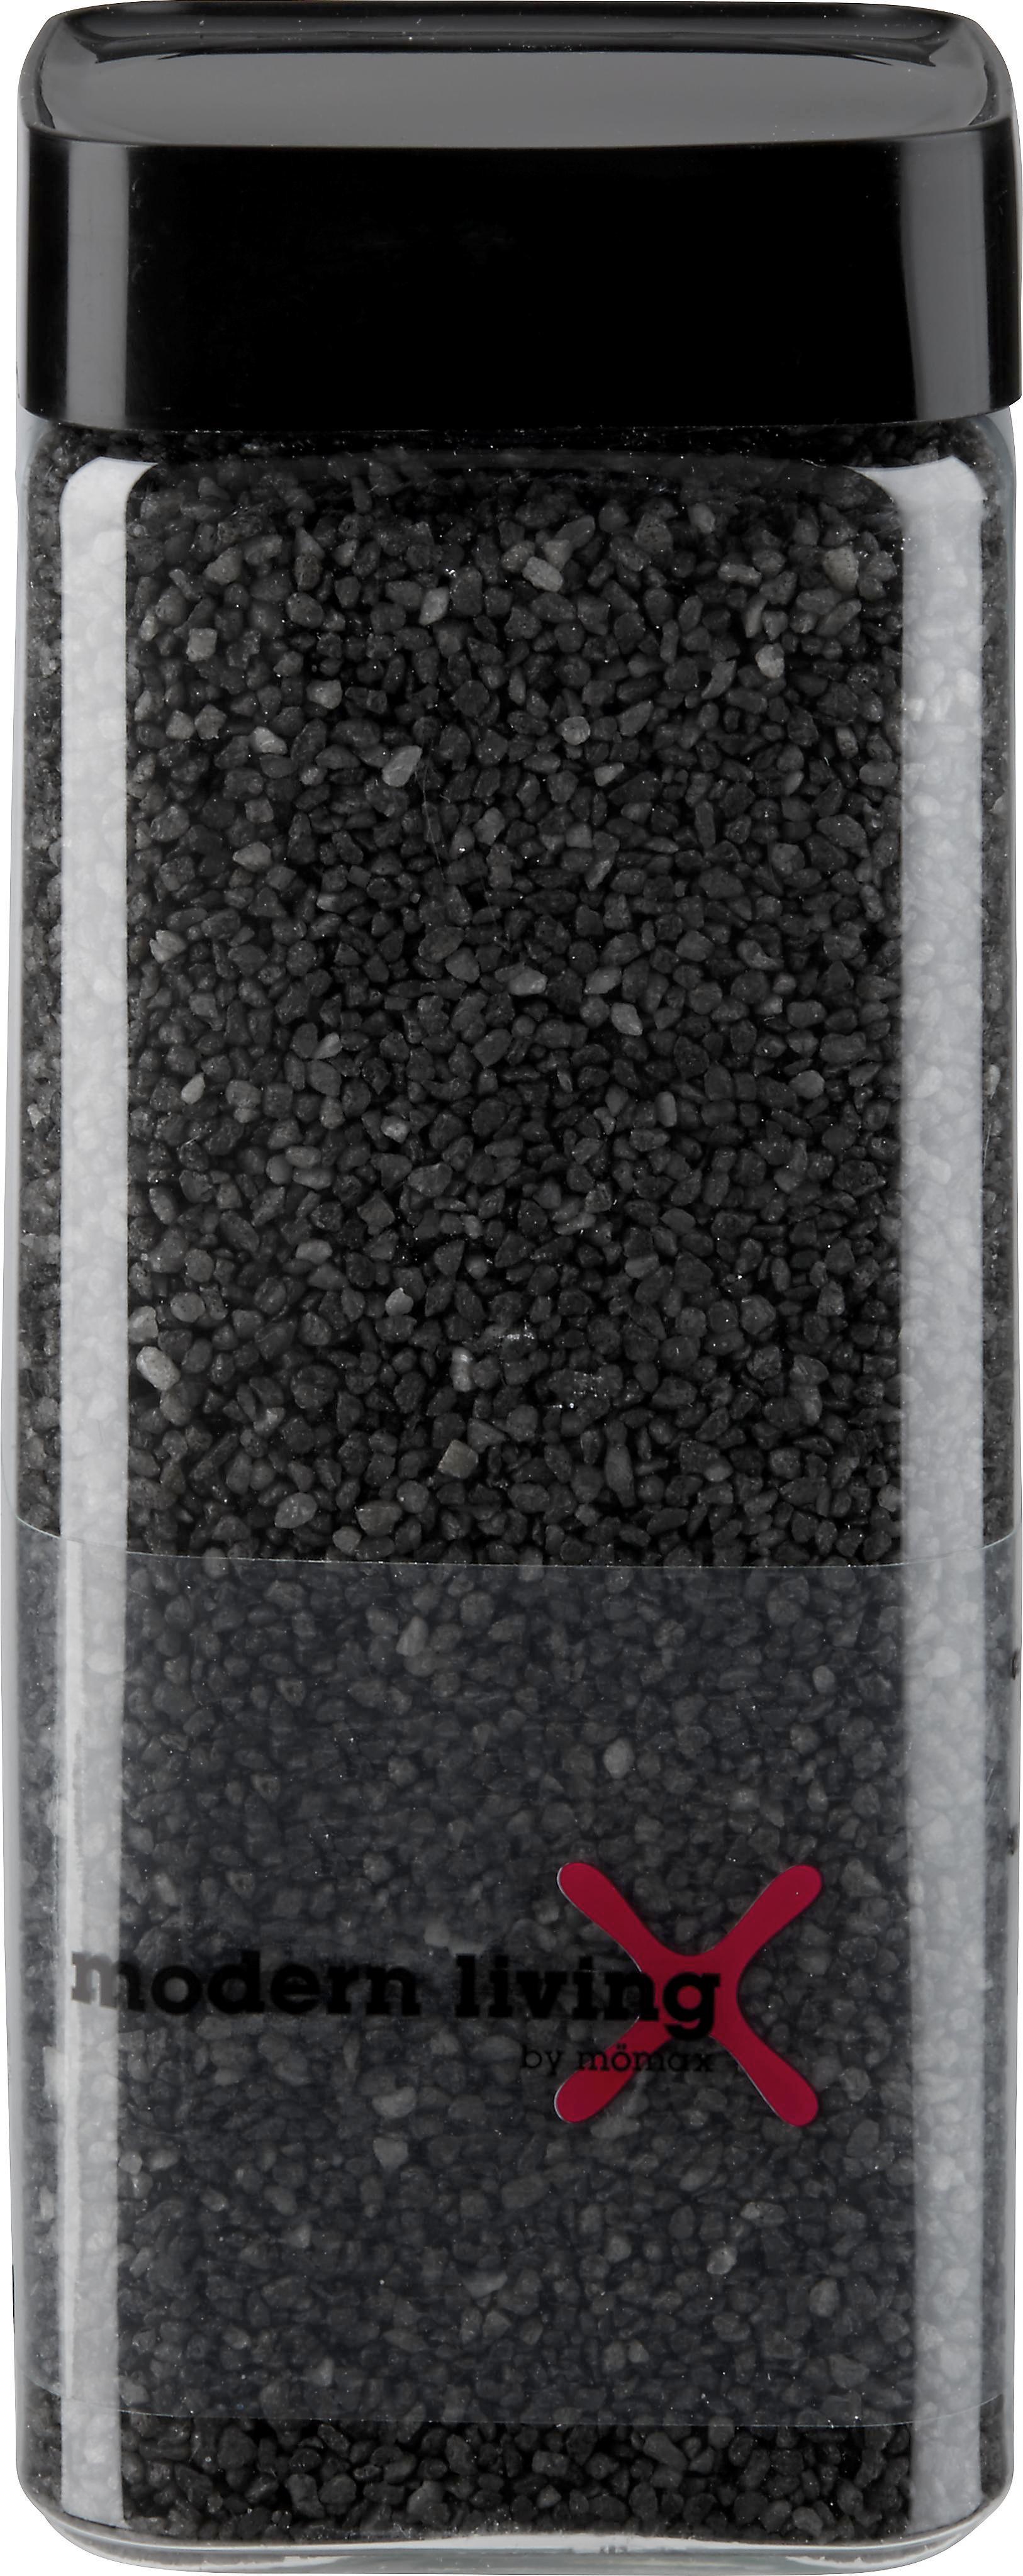 Dekor Granulátum Perlkies - antracit, konvencionális, kő (0,550l)